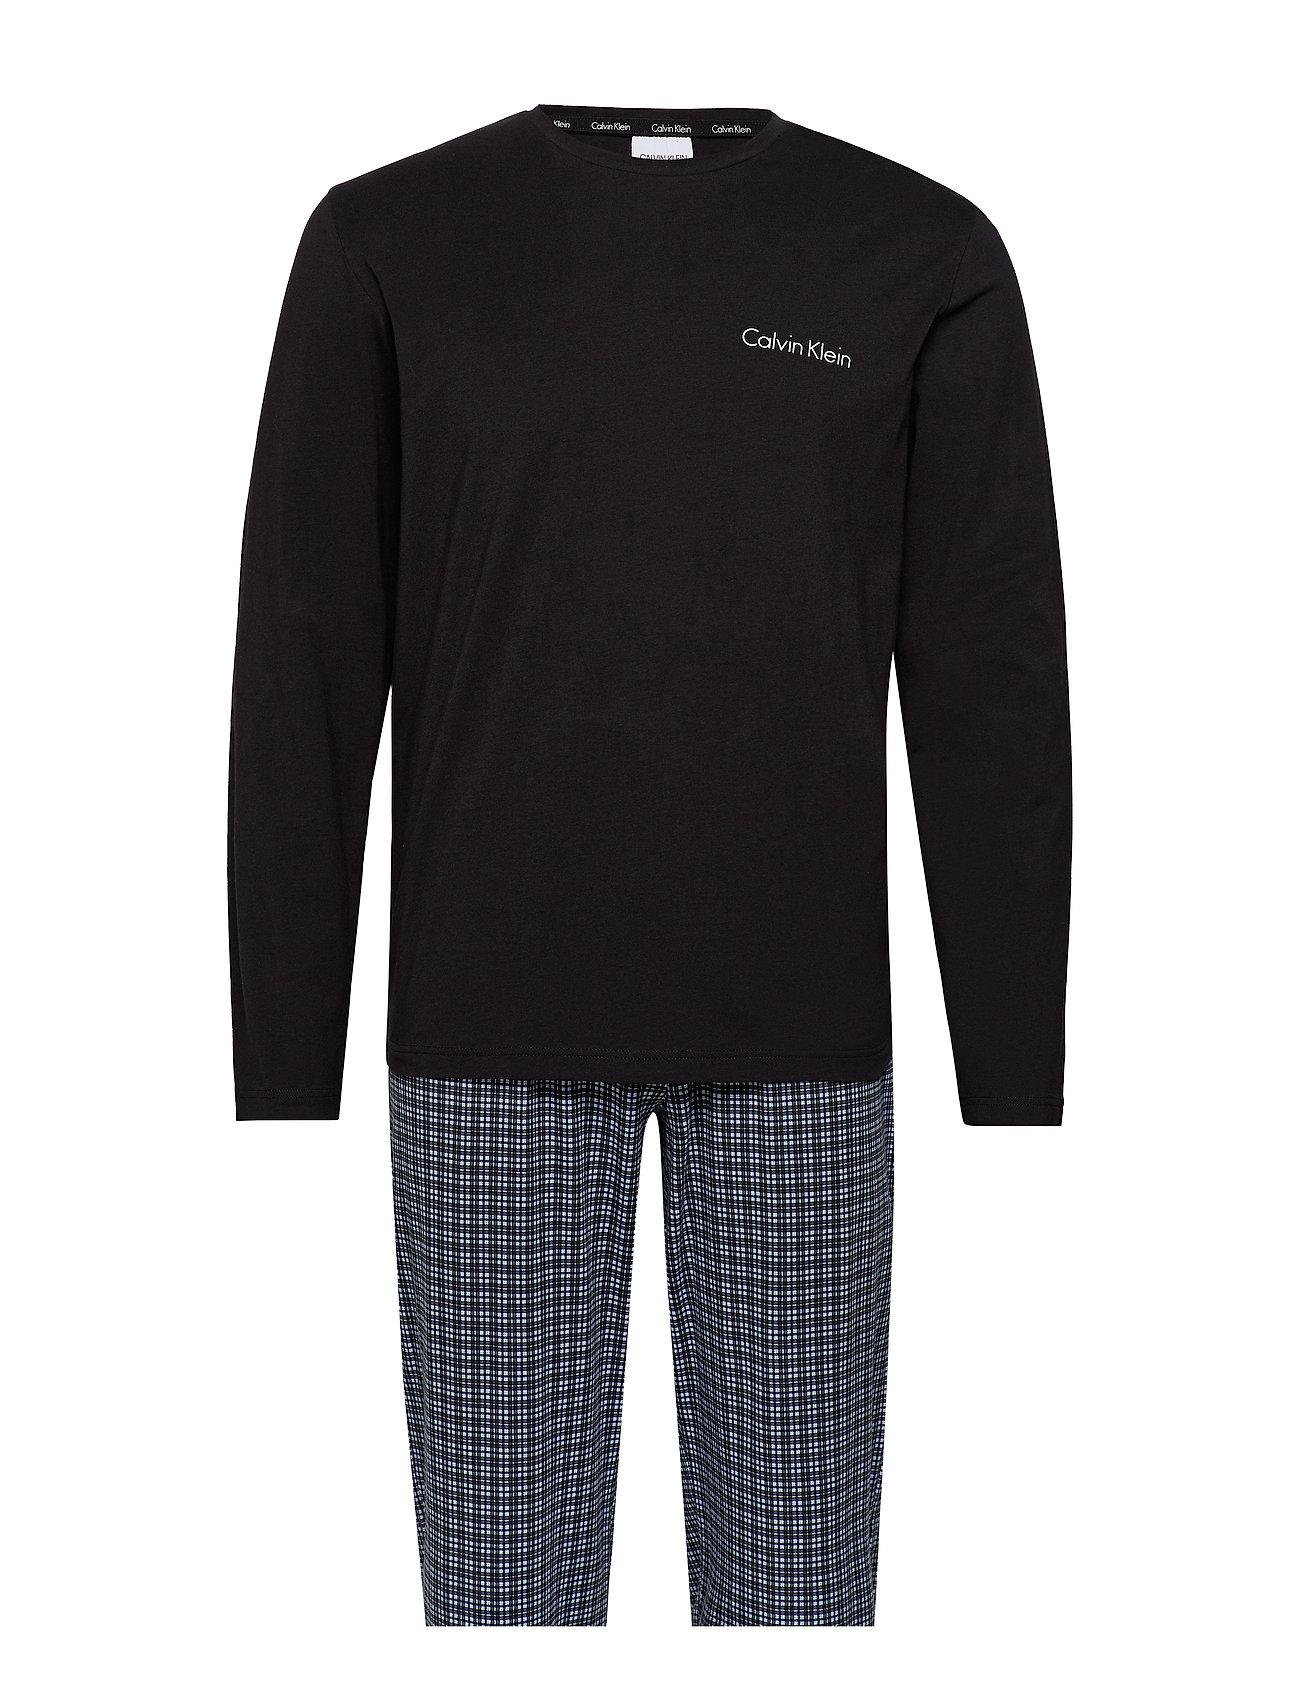 Calvin Klein L/S PANT SET - BLACK TOP /MILFORD PLAID PANT